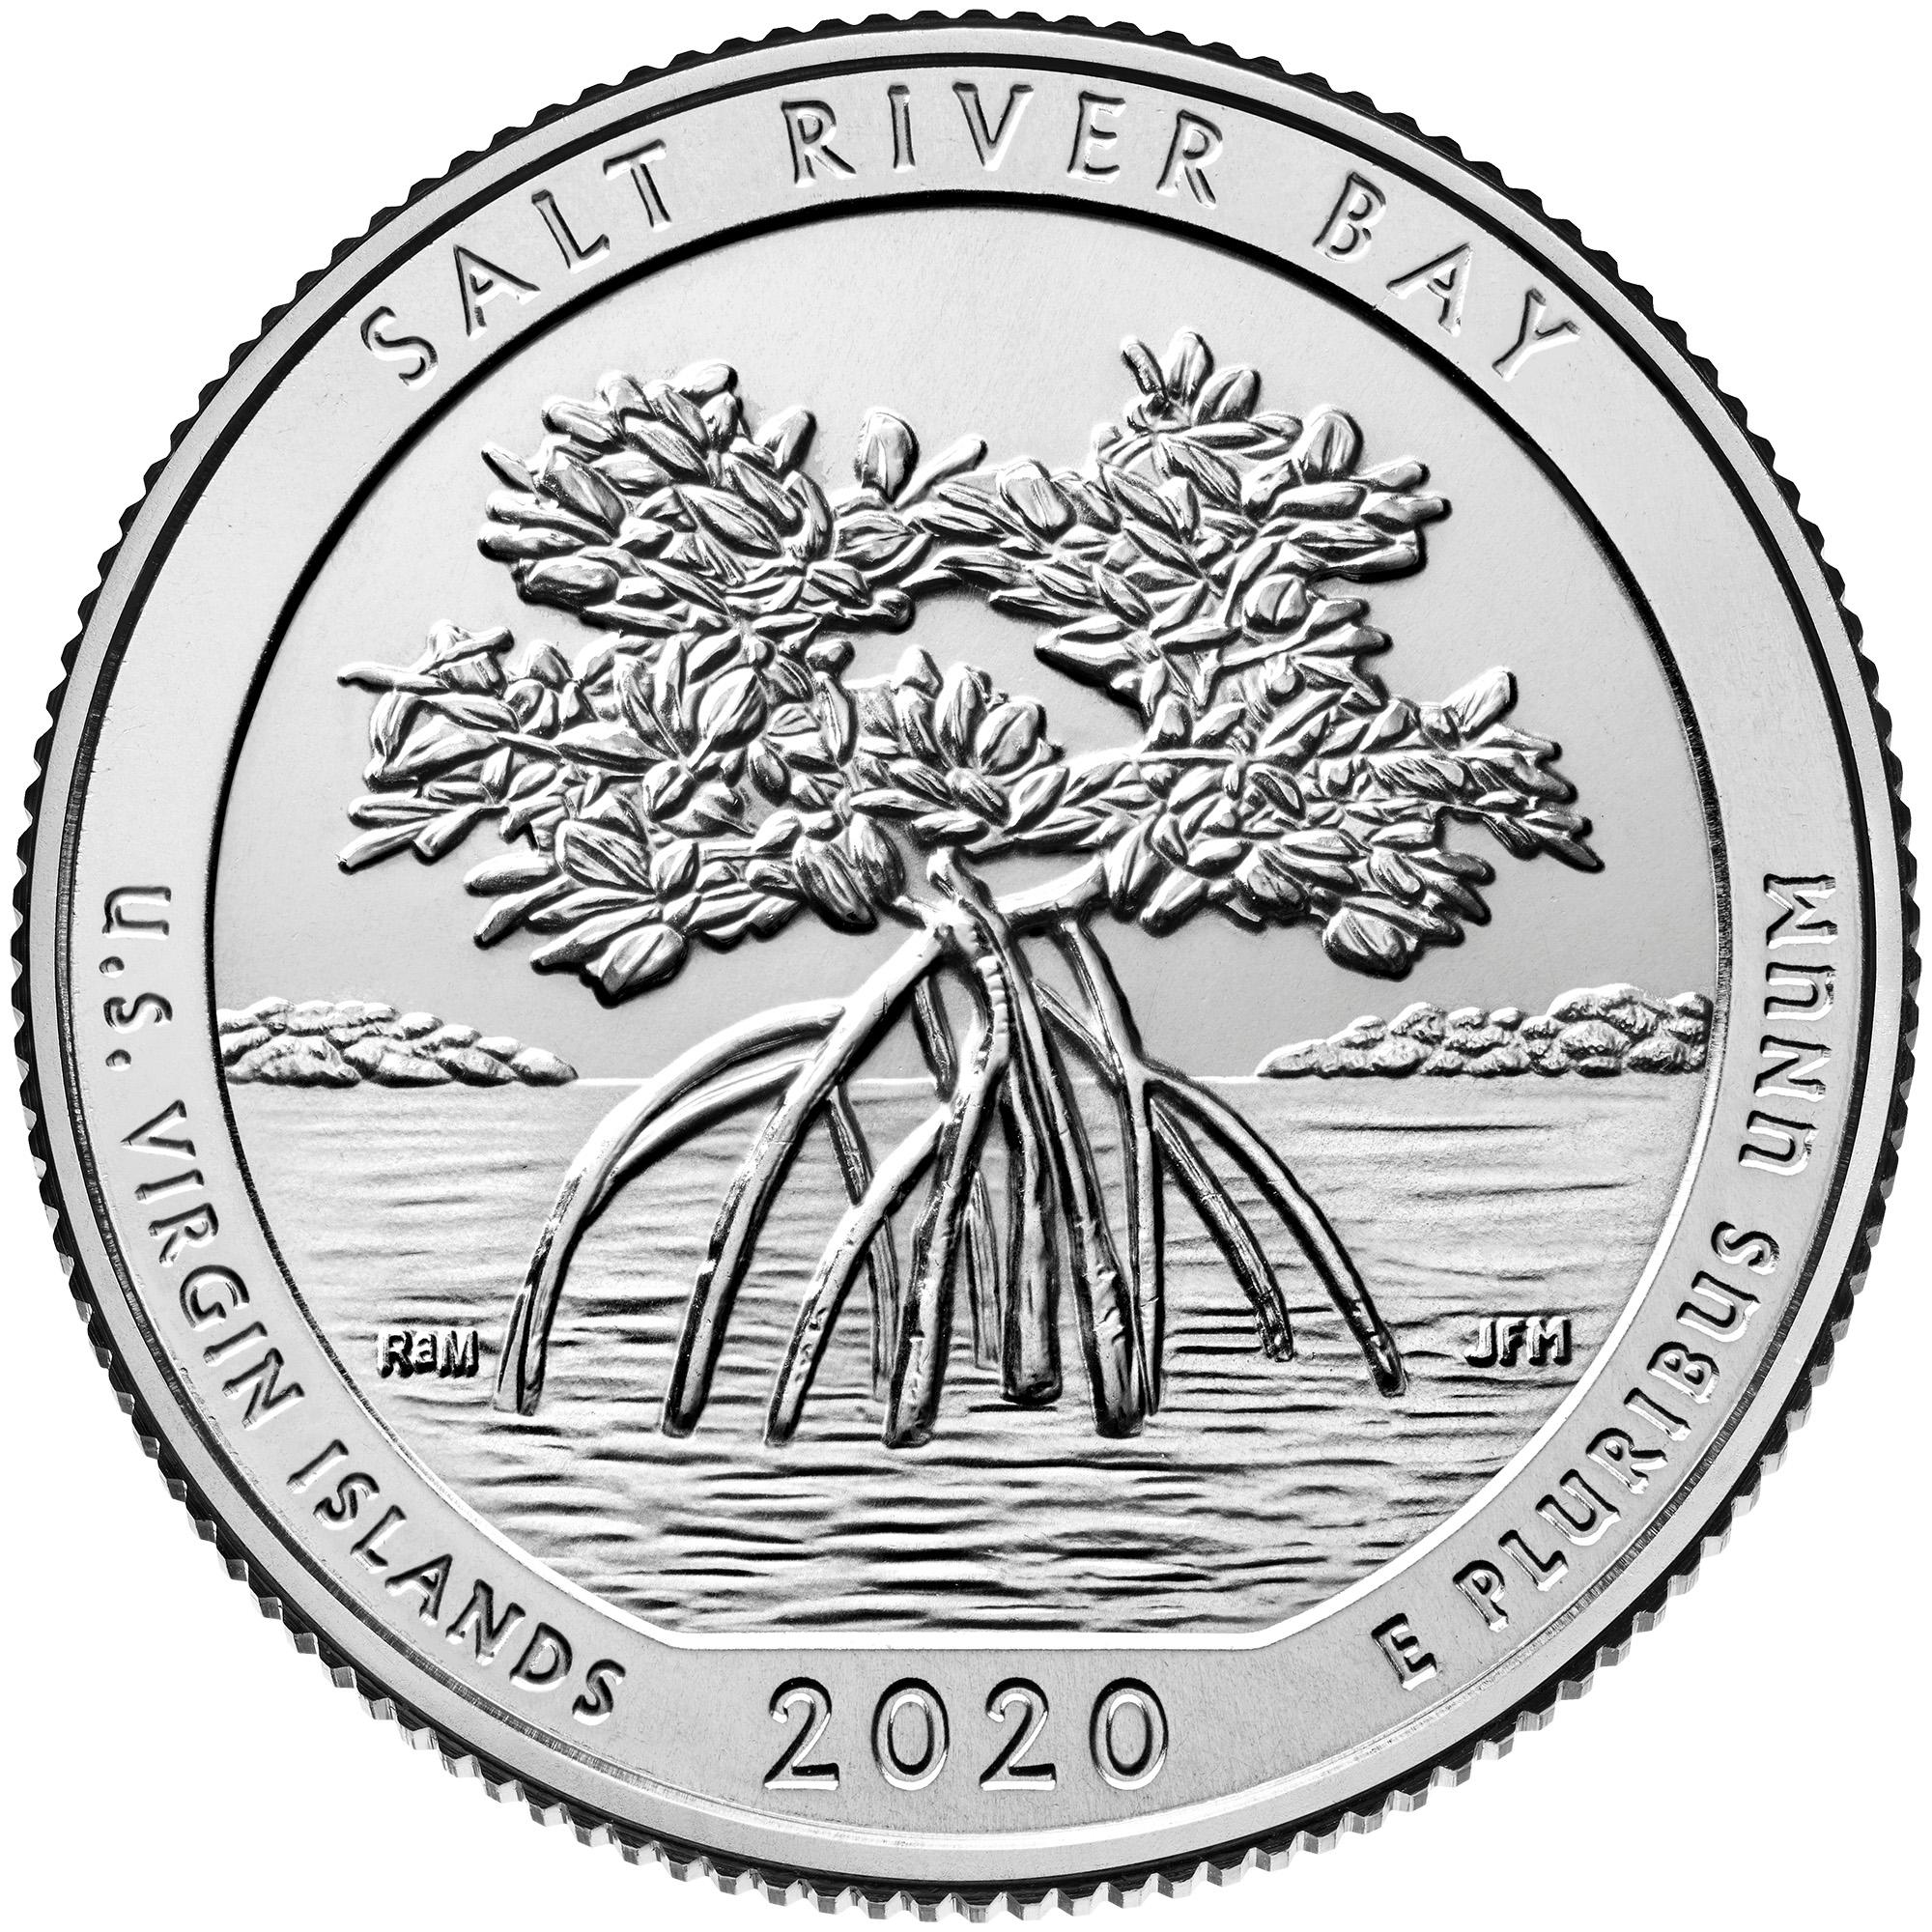 2020 America the Beautiful Quarters Coin Salt River Bay U.S. Virgin Islands Uncirculated Reverse